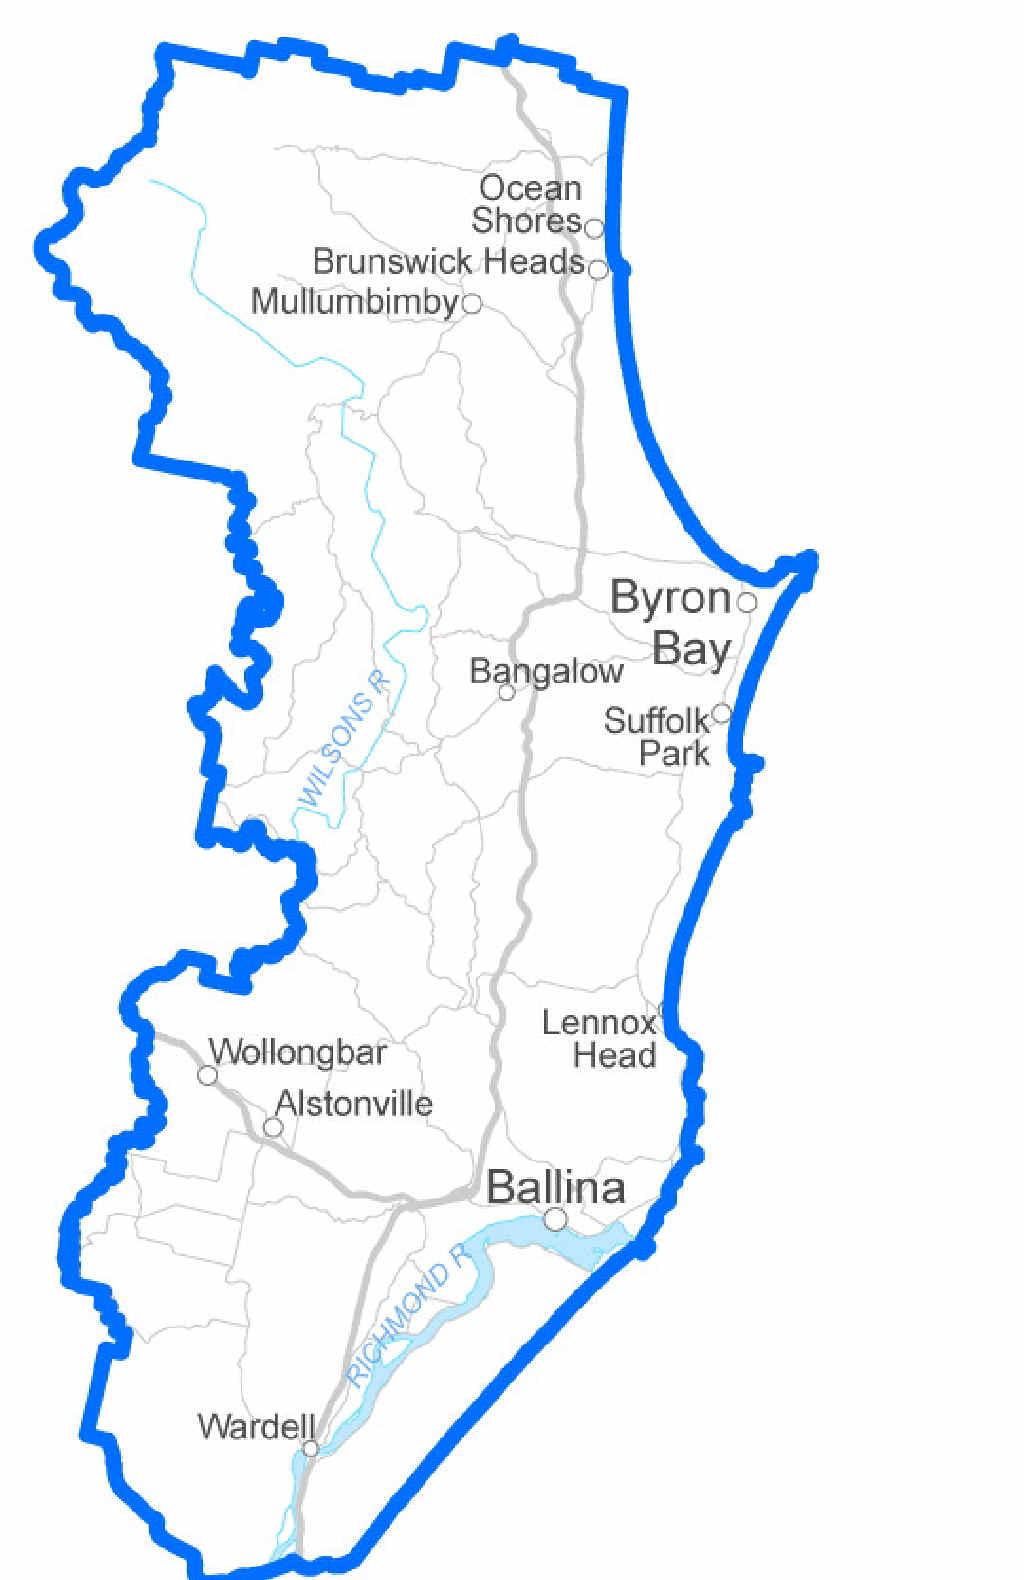 The electorate of Ballina